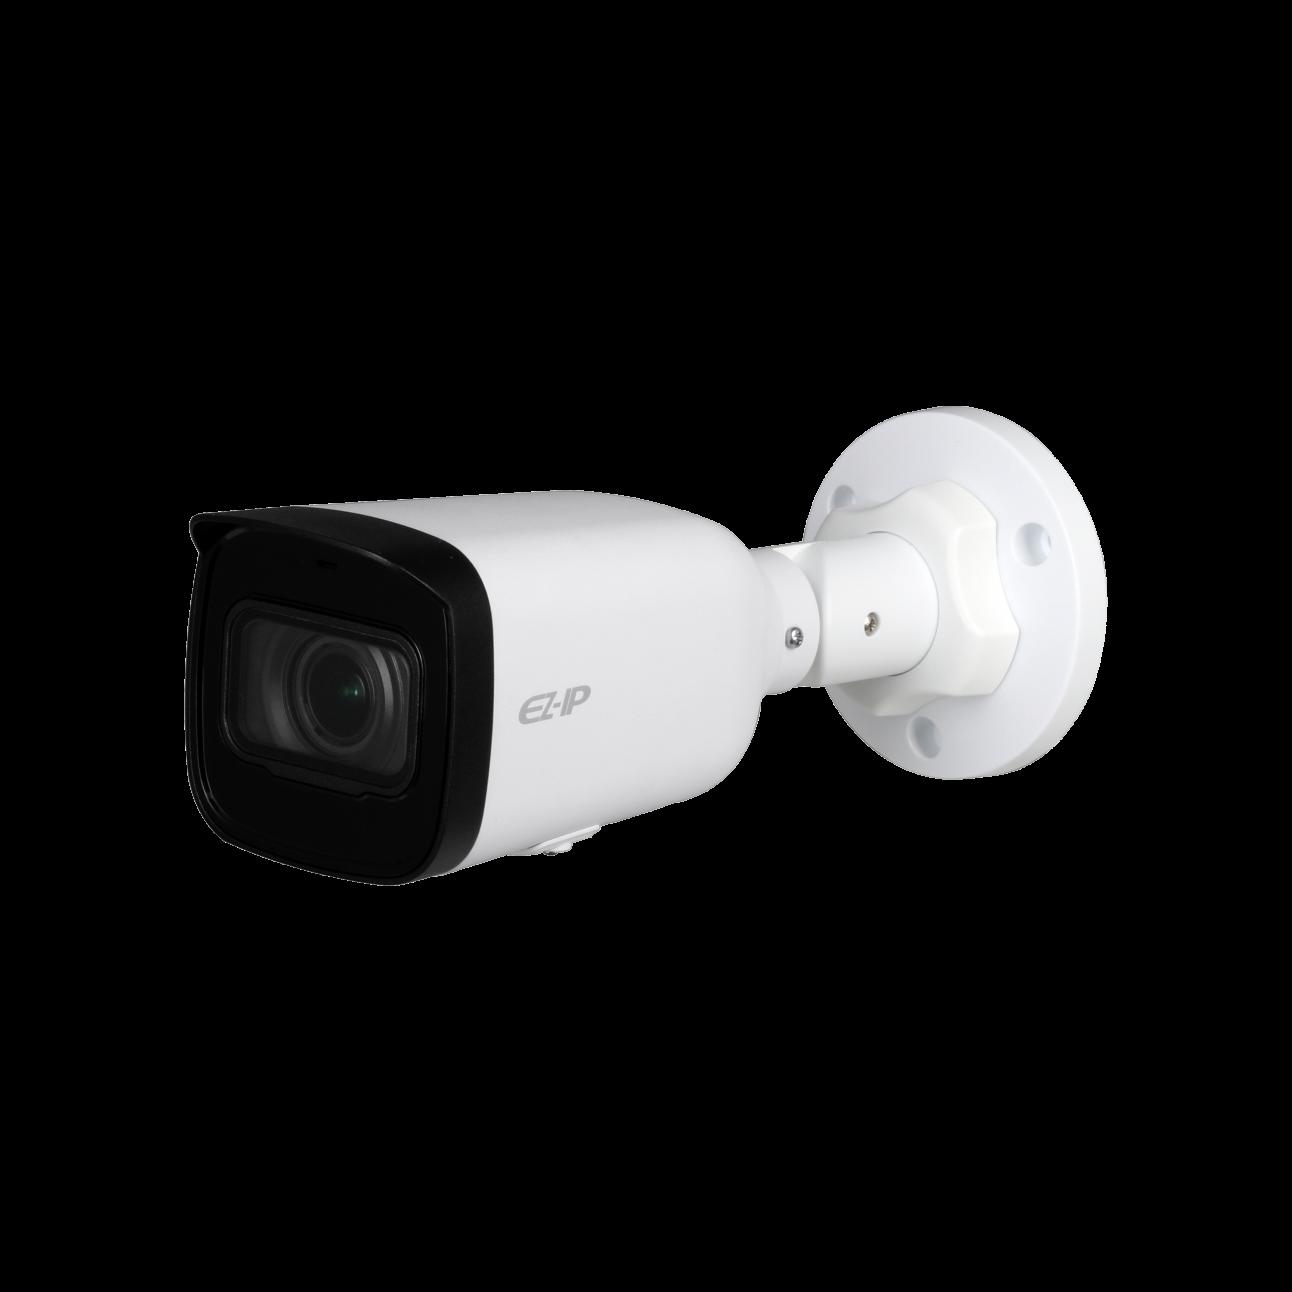 IP камера Dahua EZ-IPC-B2B20-ZS уличная цилиндрическая 2Мп, мотор. объектив 2.8-12мм, ИК до 30м, MicroSD, DC12В/PoE, IP67